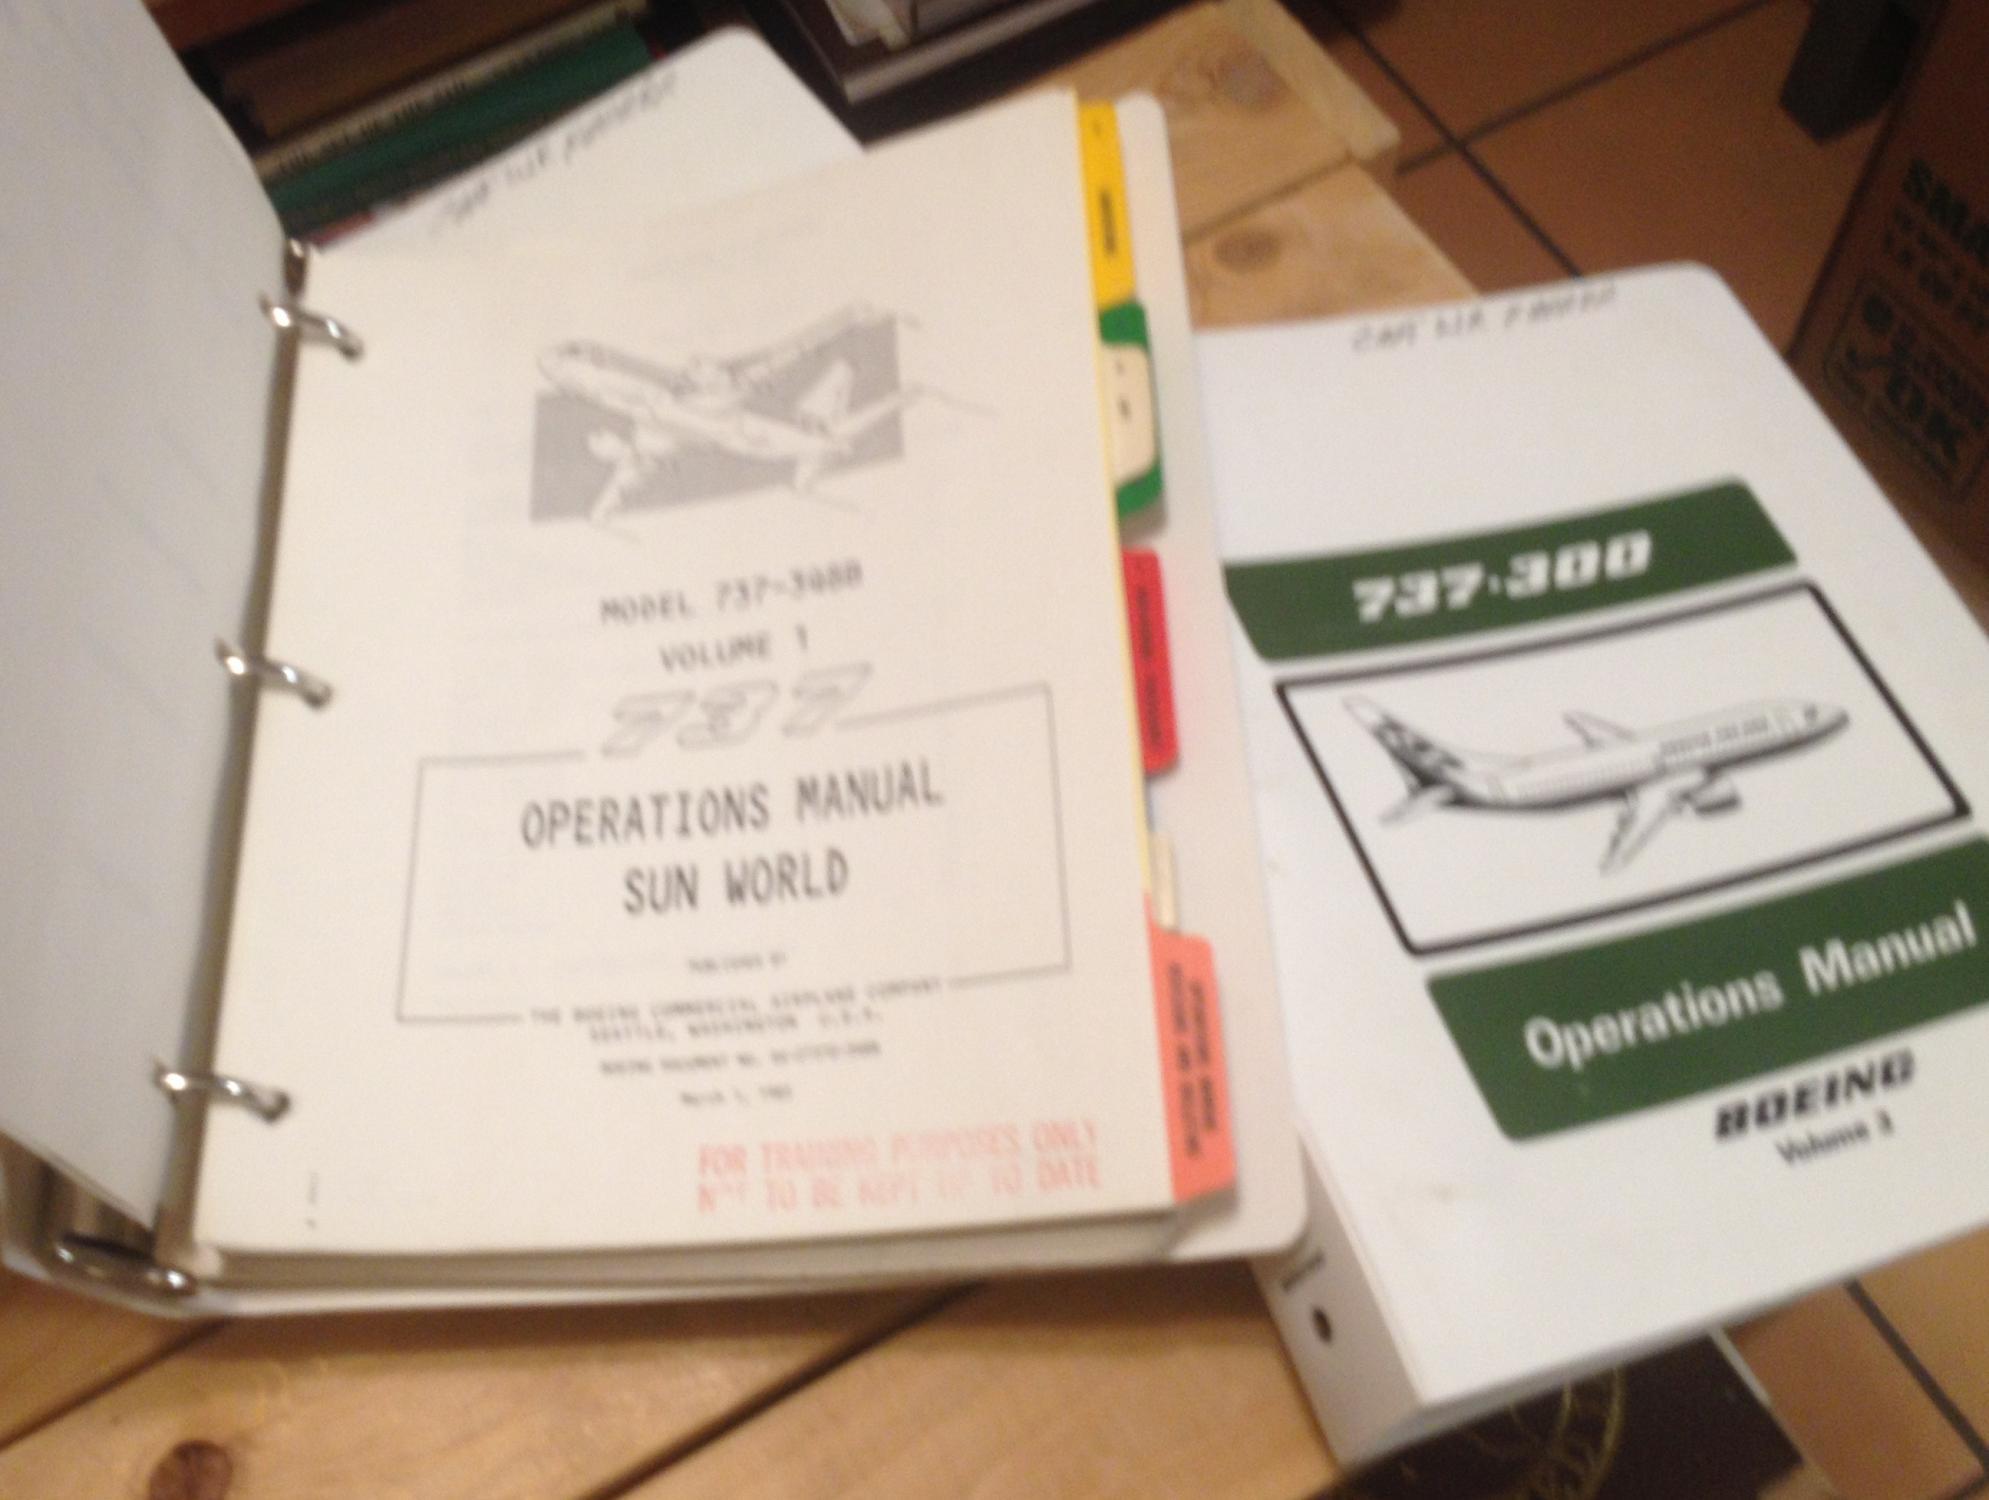 boeings operational manual